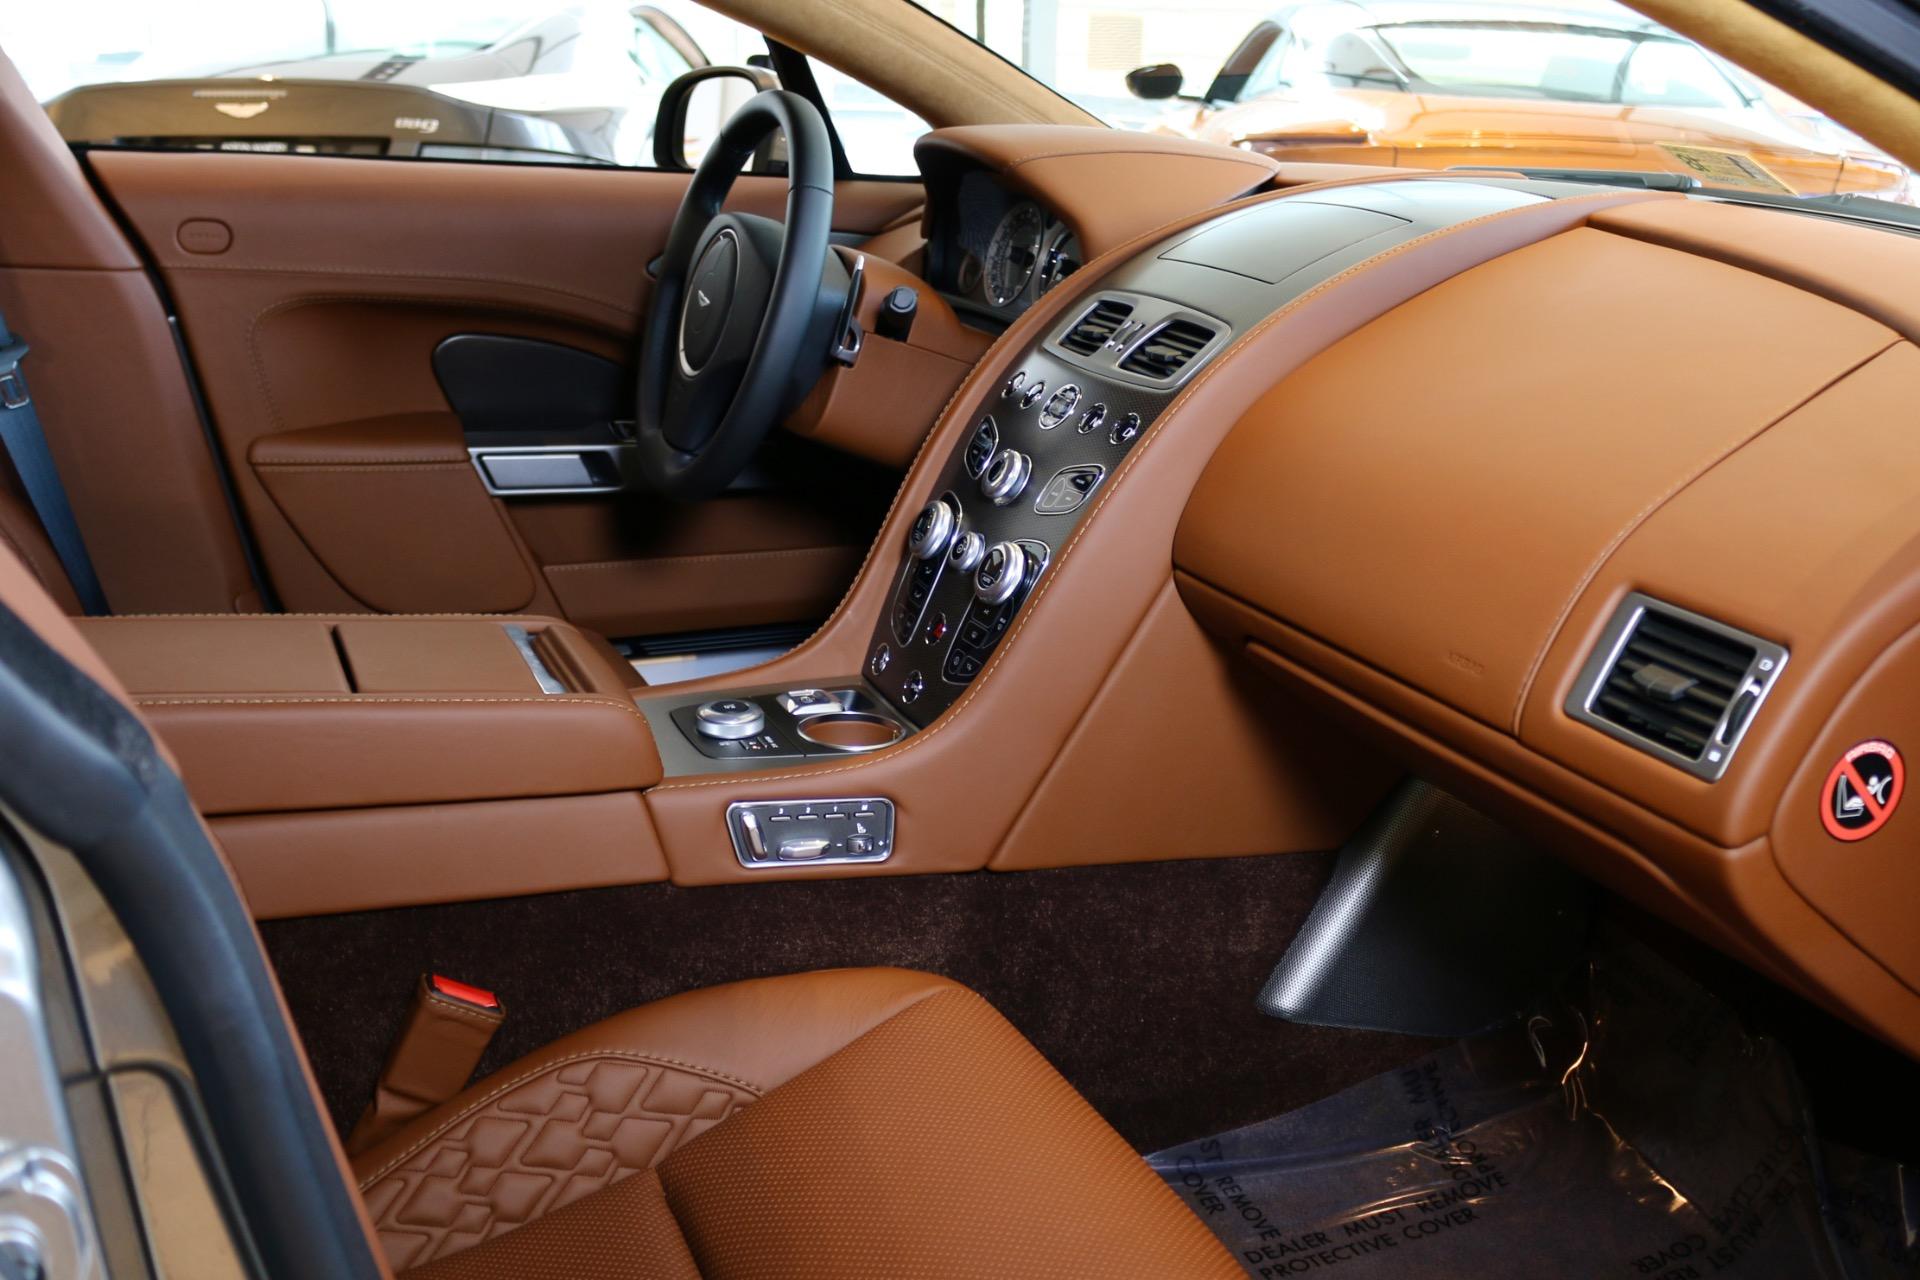 Aston Martin Rapide S Stock GF For Sale Near Vienna VA - 2018 aston martin rapide s